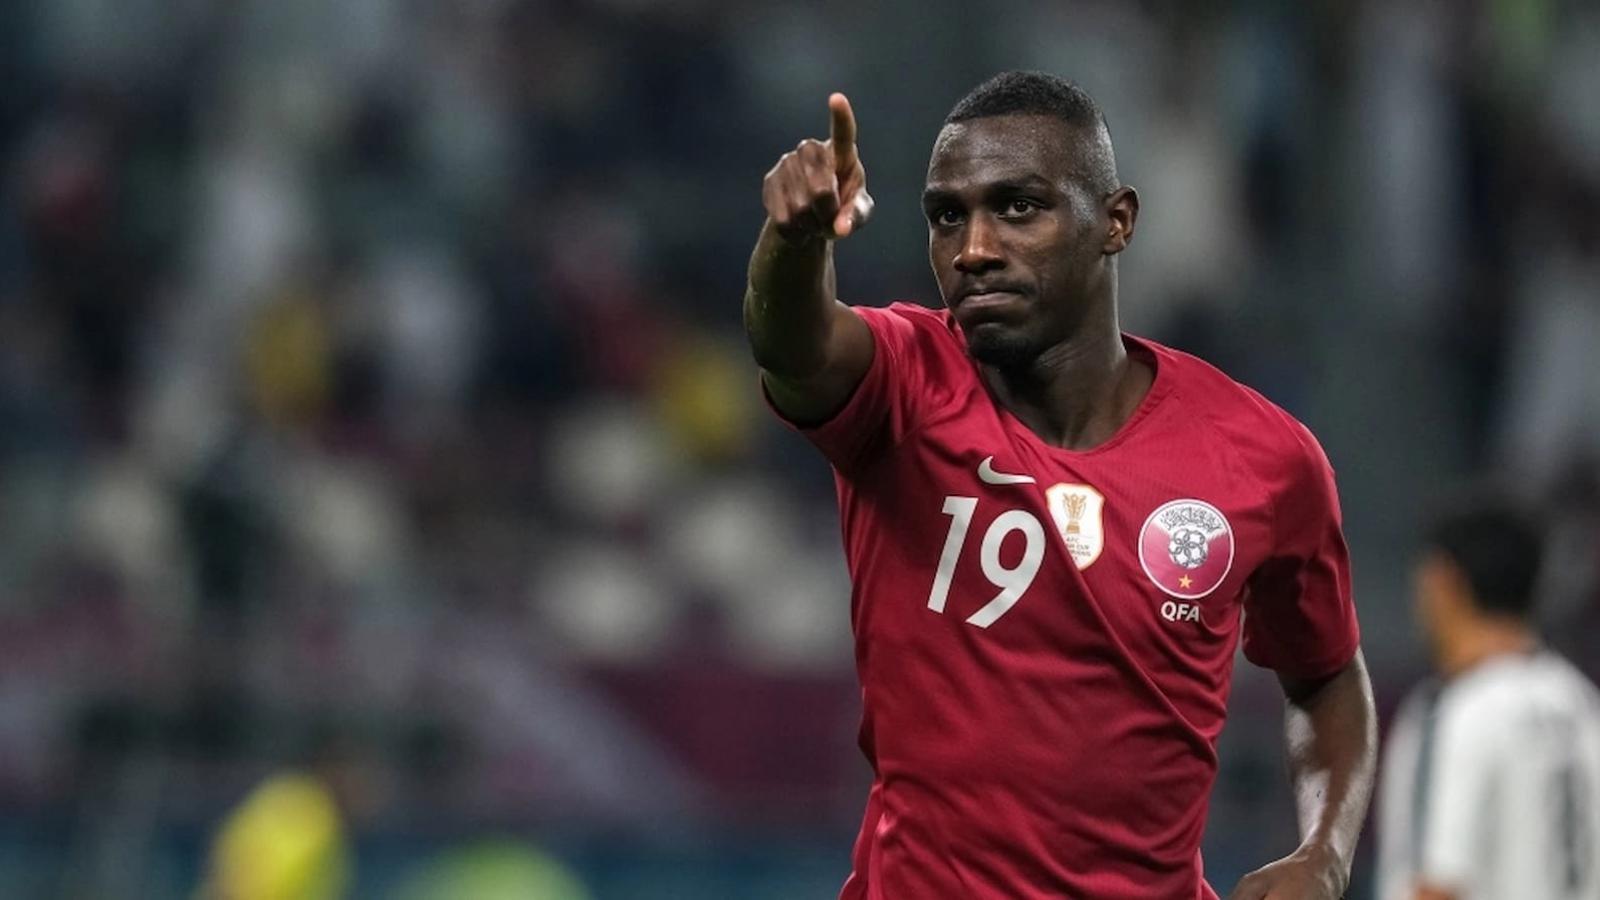 Qatar's Al Moez Ali first footballer to score in three continental tournaments